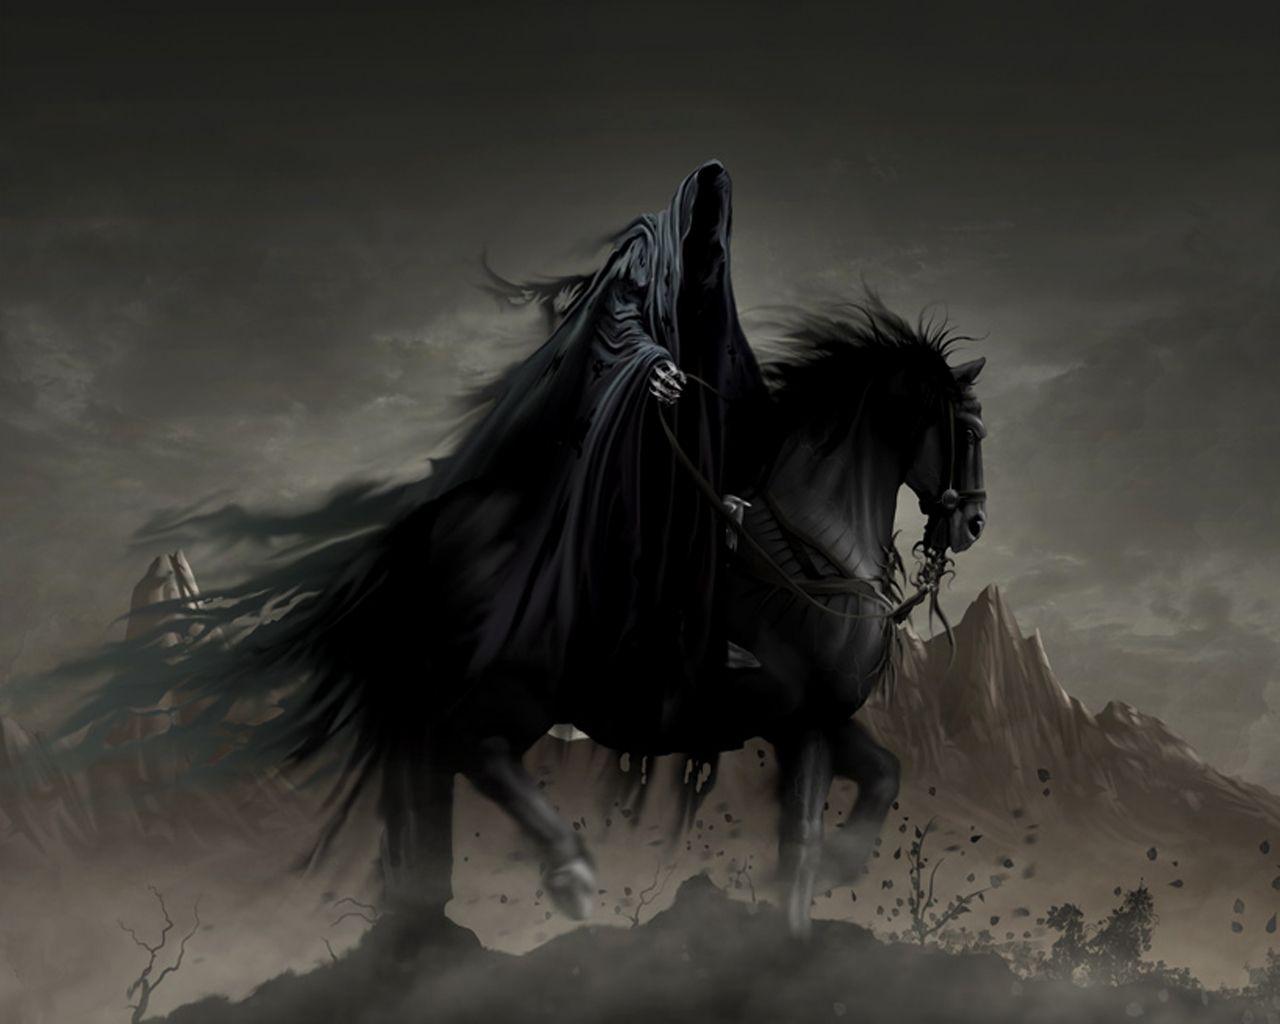 Wonderful Wallpaper Horse Gothic - 67501f67aca3b205bd6bd86729d8c264  You Should Have_1003150.jpg